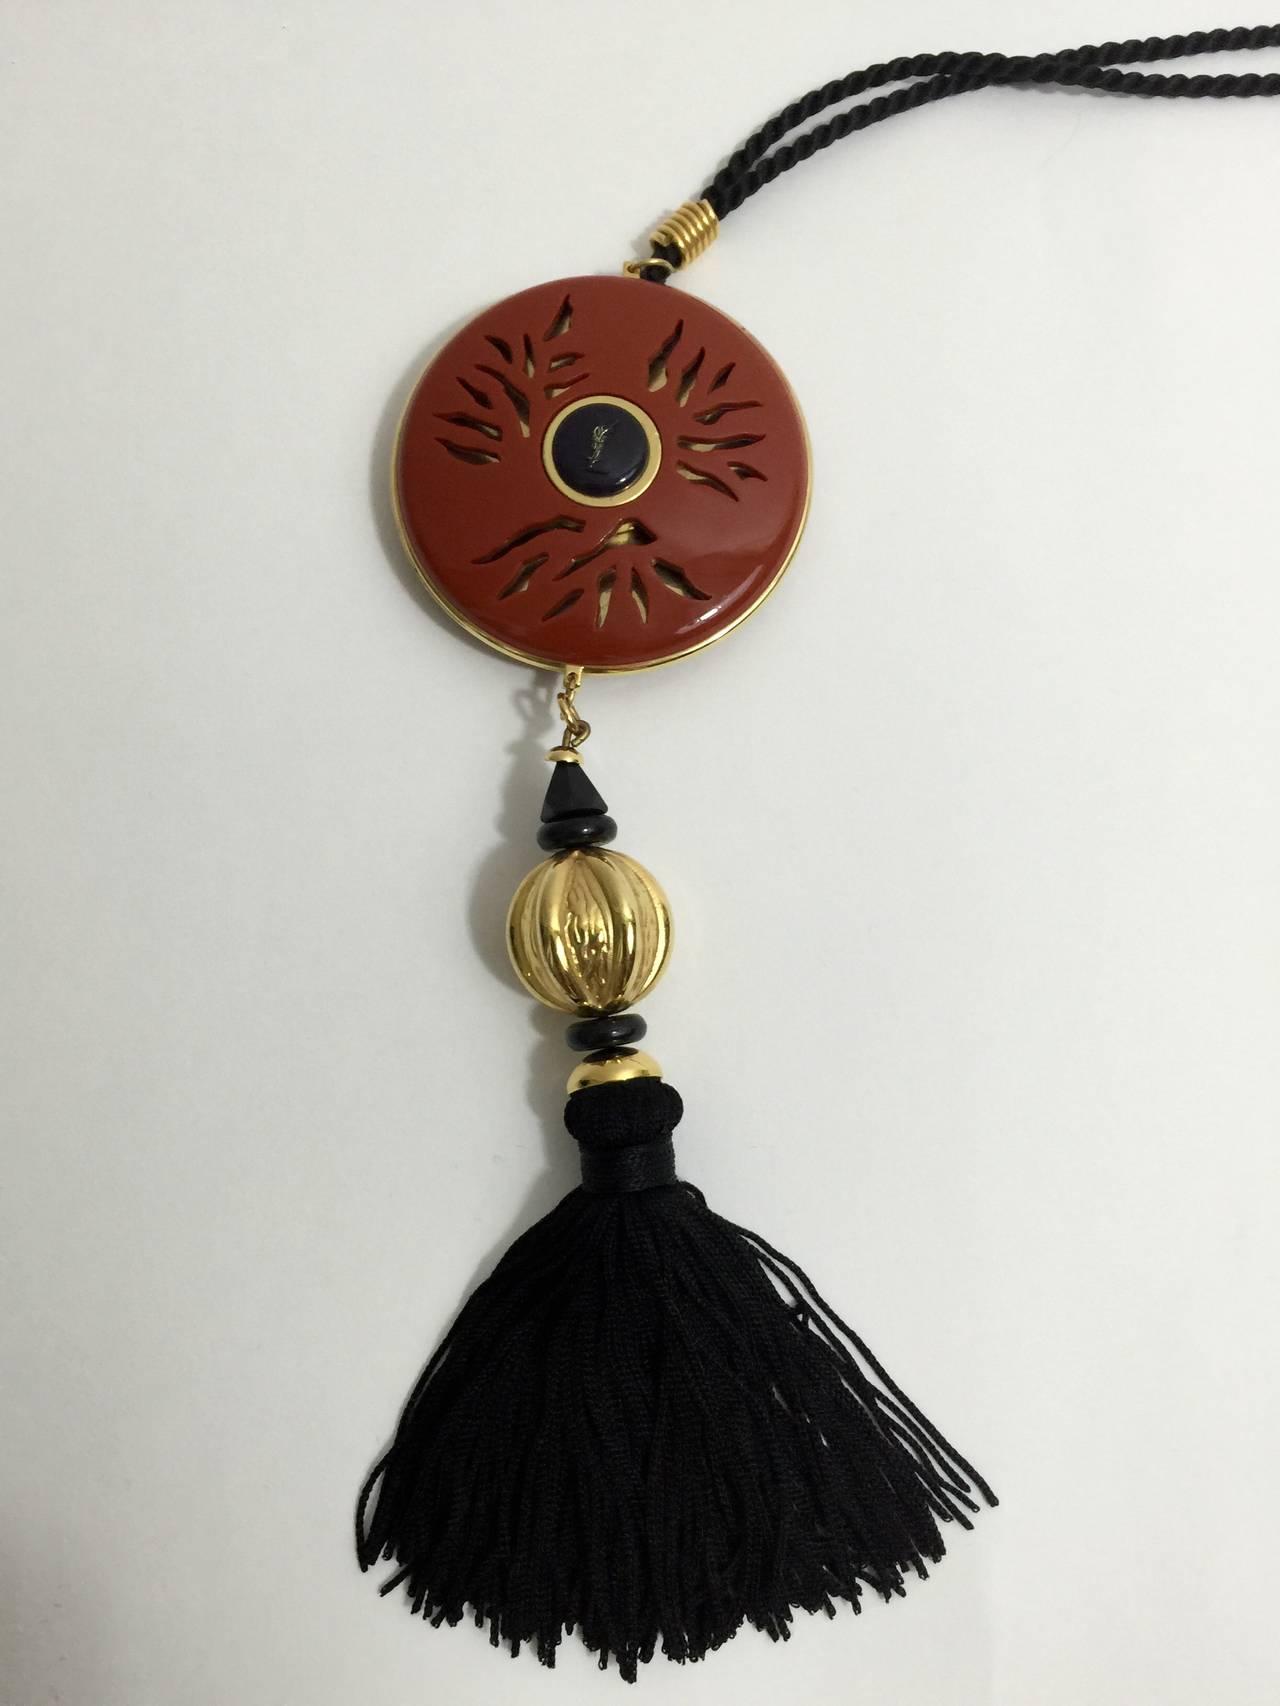 Yves Saint Laurent Vintage Opium Pendant & Gold Bead Black Tassel Necklace 8